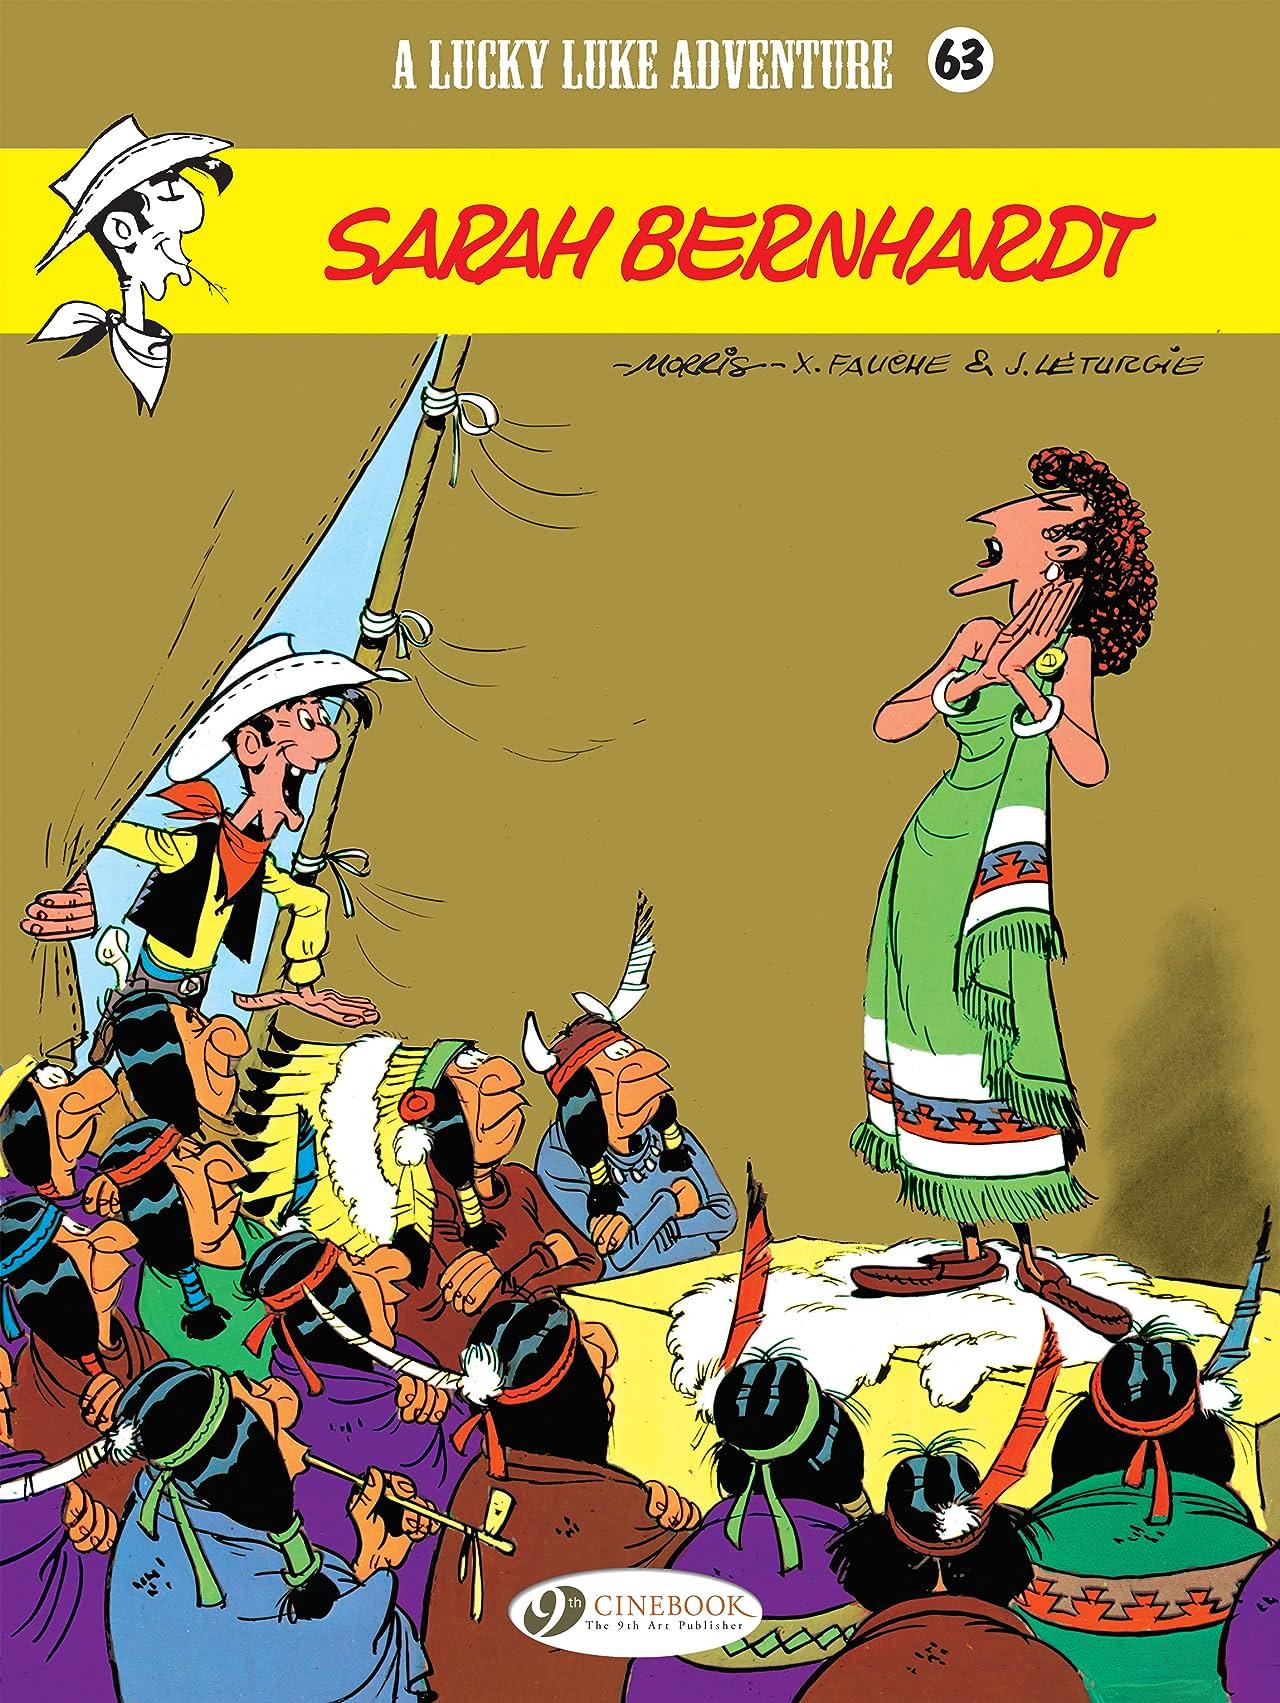 Lucky Luke Vol. 63: Sarah Bernhardt